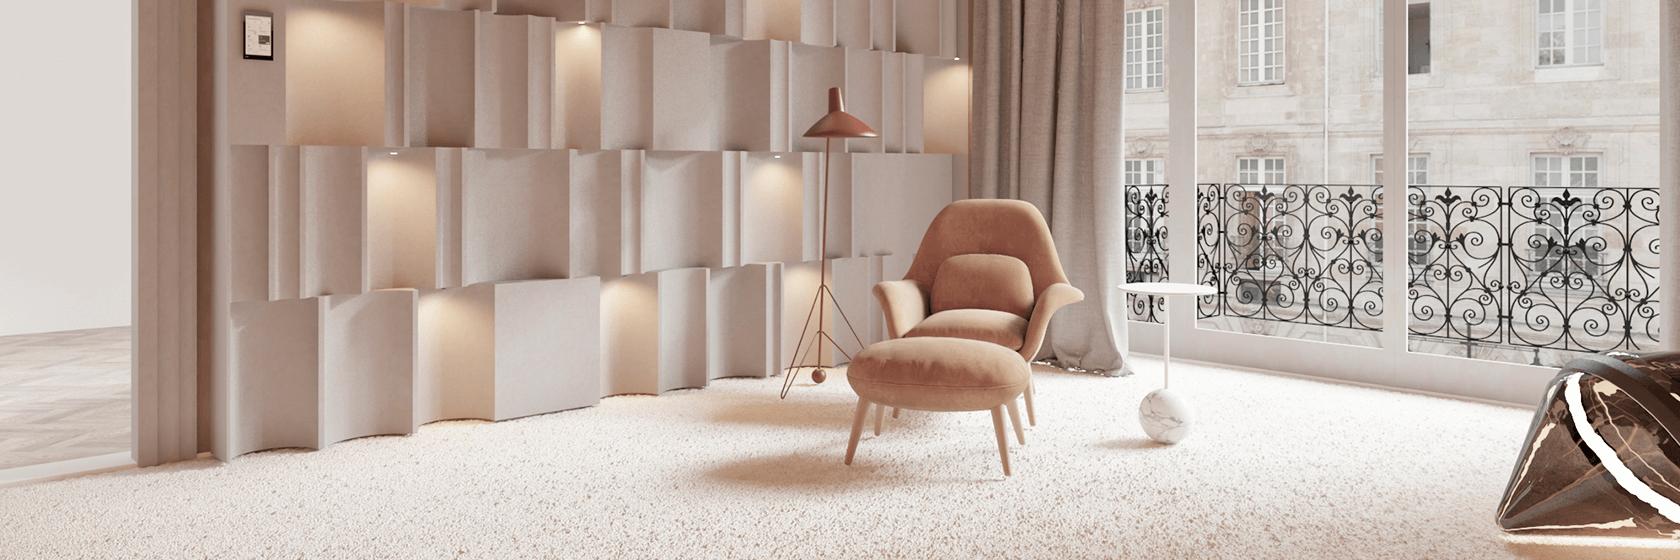 La domótica de GIRA en Modern Times | The Room Studio